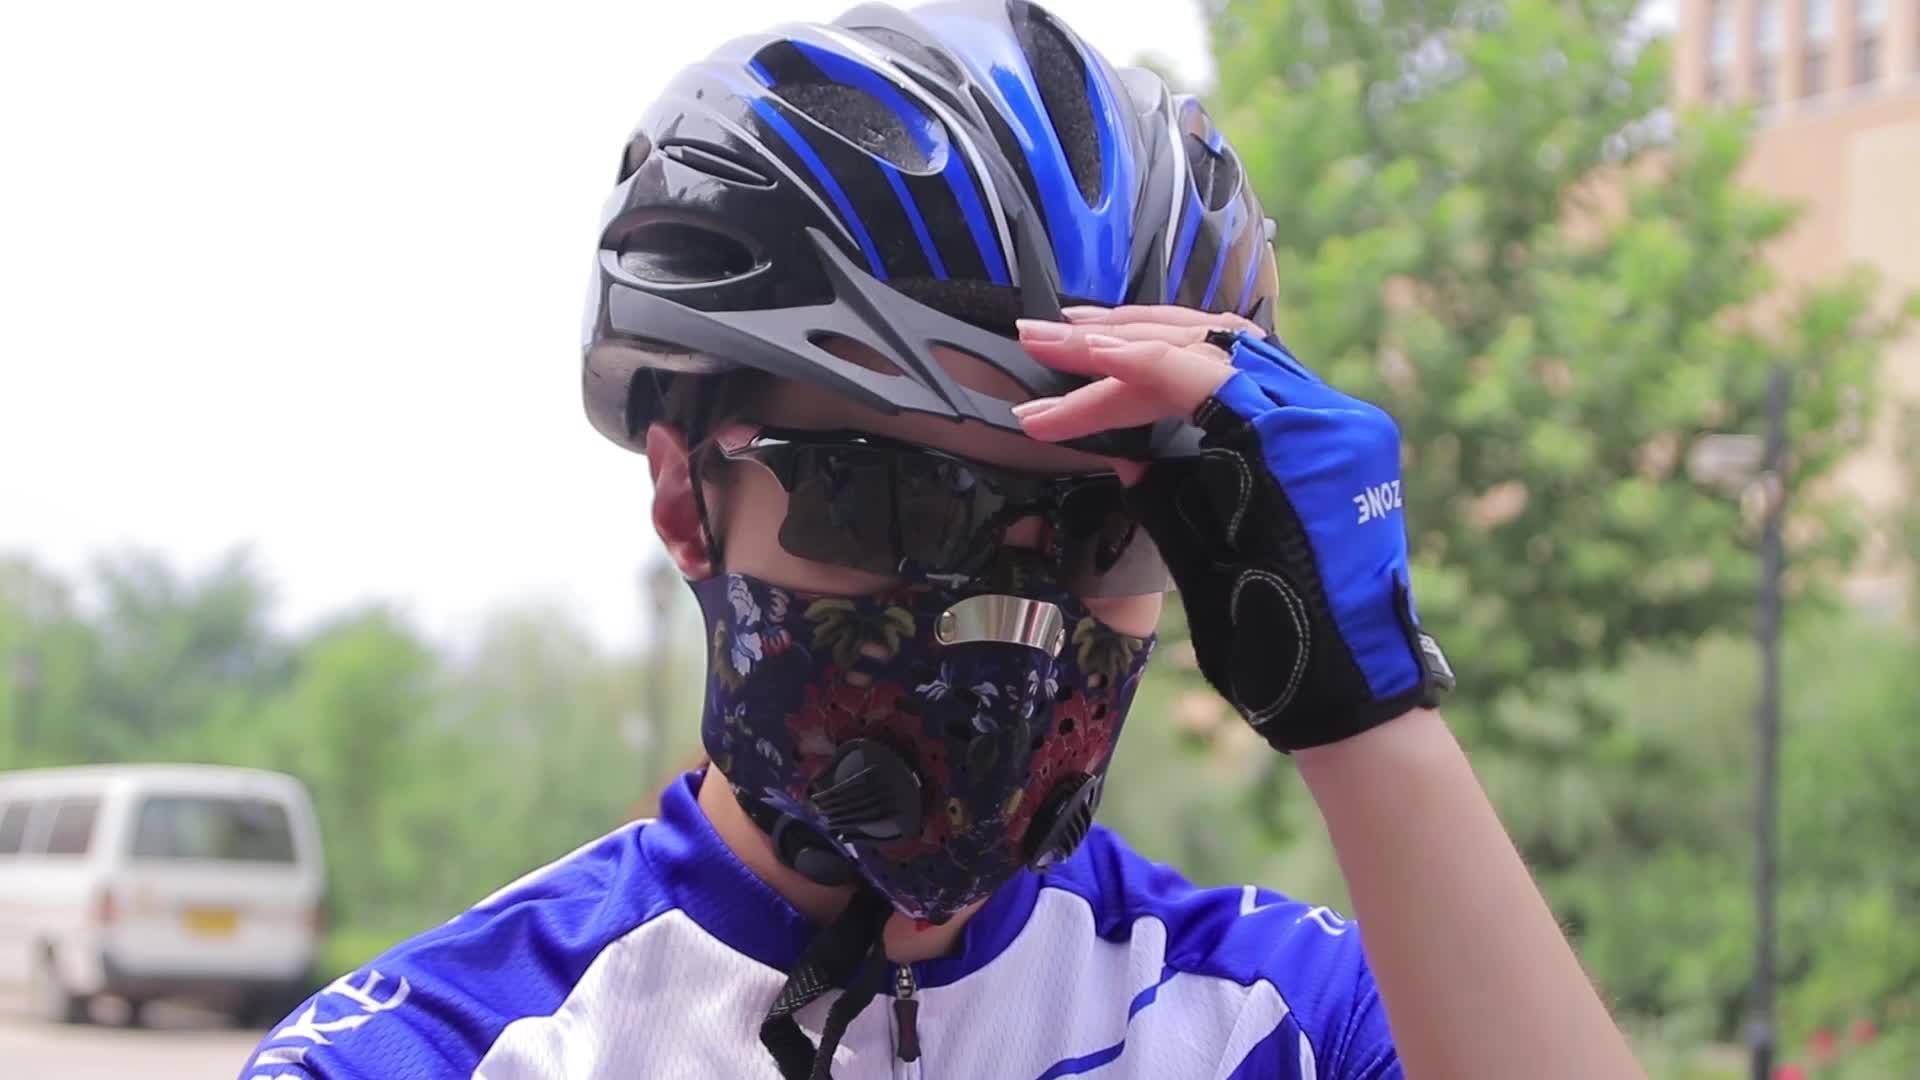 Fiets motorfiets luchtvervuiling antismog respirator gezicht mond masker N95